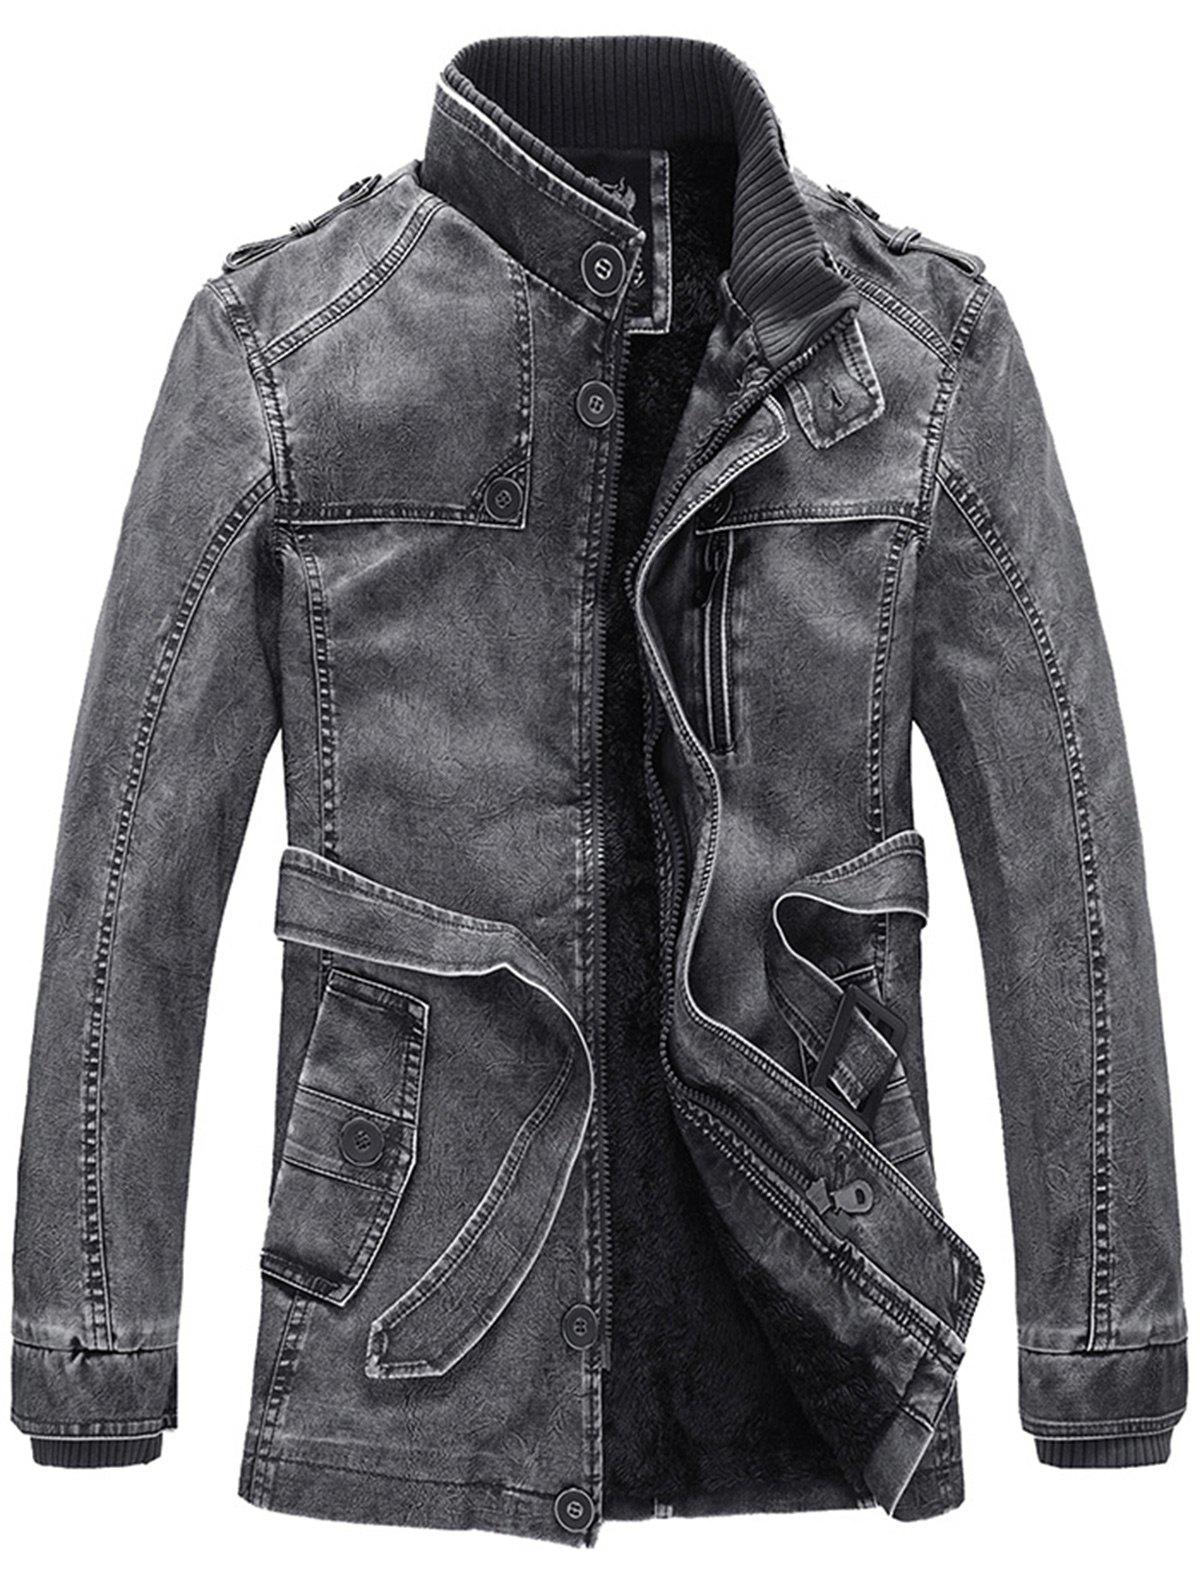 Stand Collar Rib Panel Epaulet Fleece PU Leather Coat with Belt 219541004